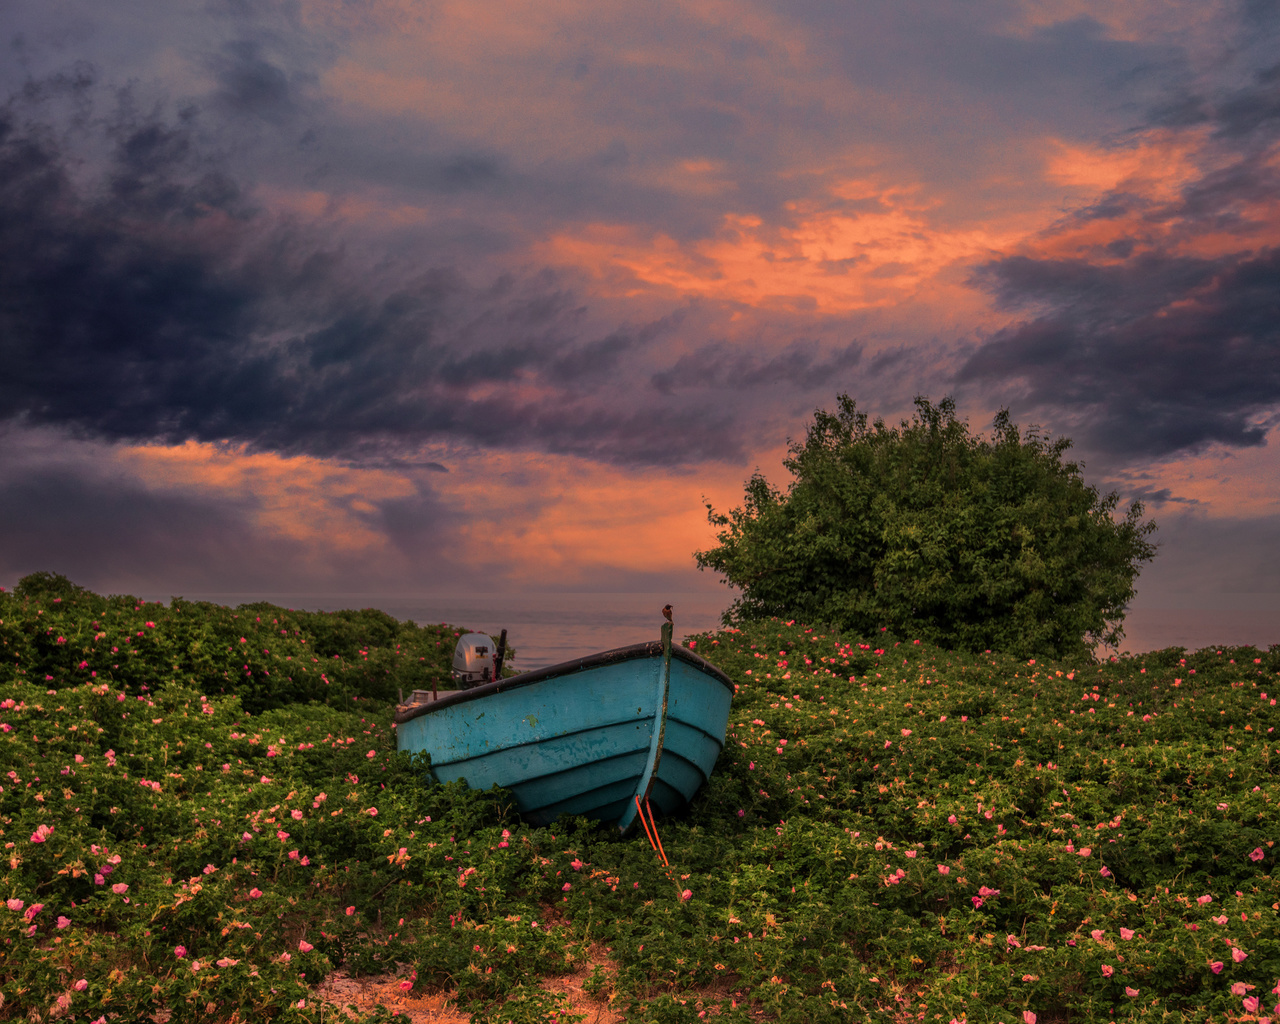 швеция, закат, лодки, небо, degeberga, трава, кусты, облака, природа